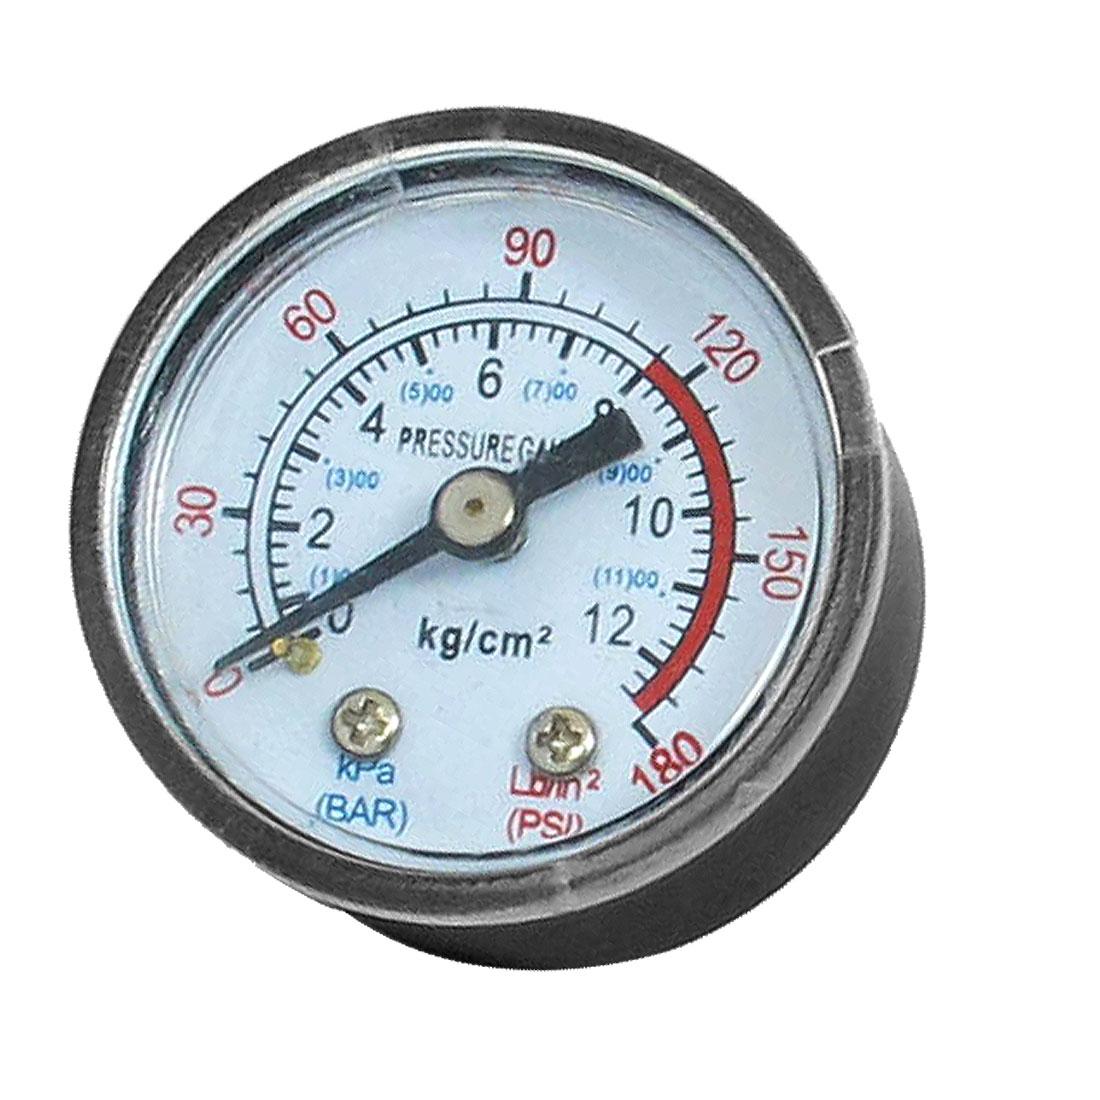 1/8BSP Air Compressor Hydraulic Back Mount Pressure Gauge 0-180 PSI